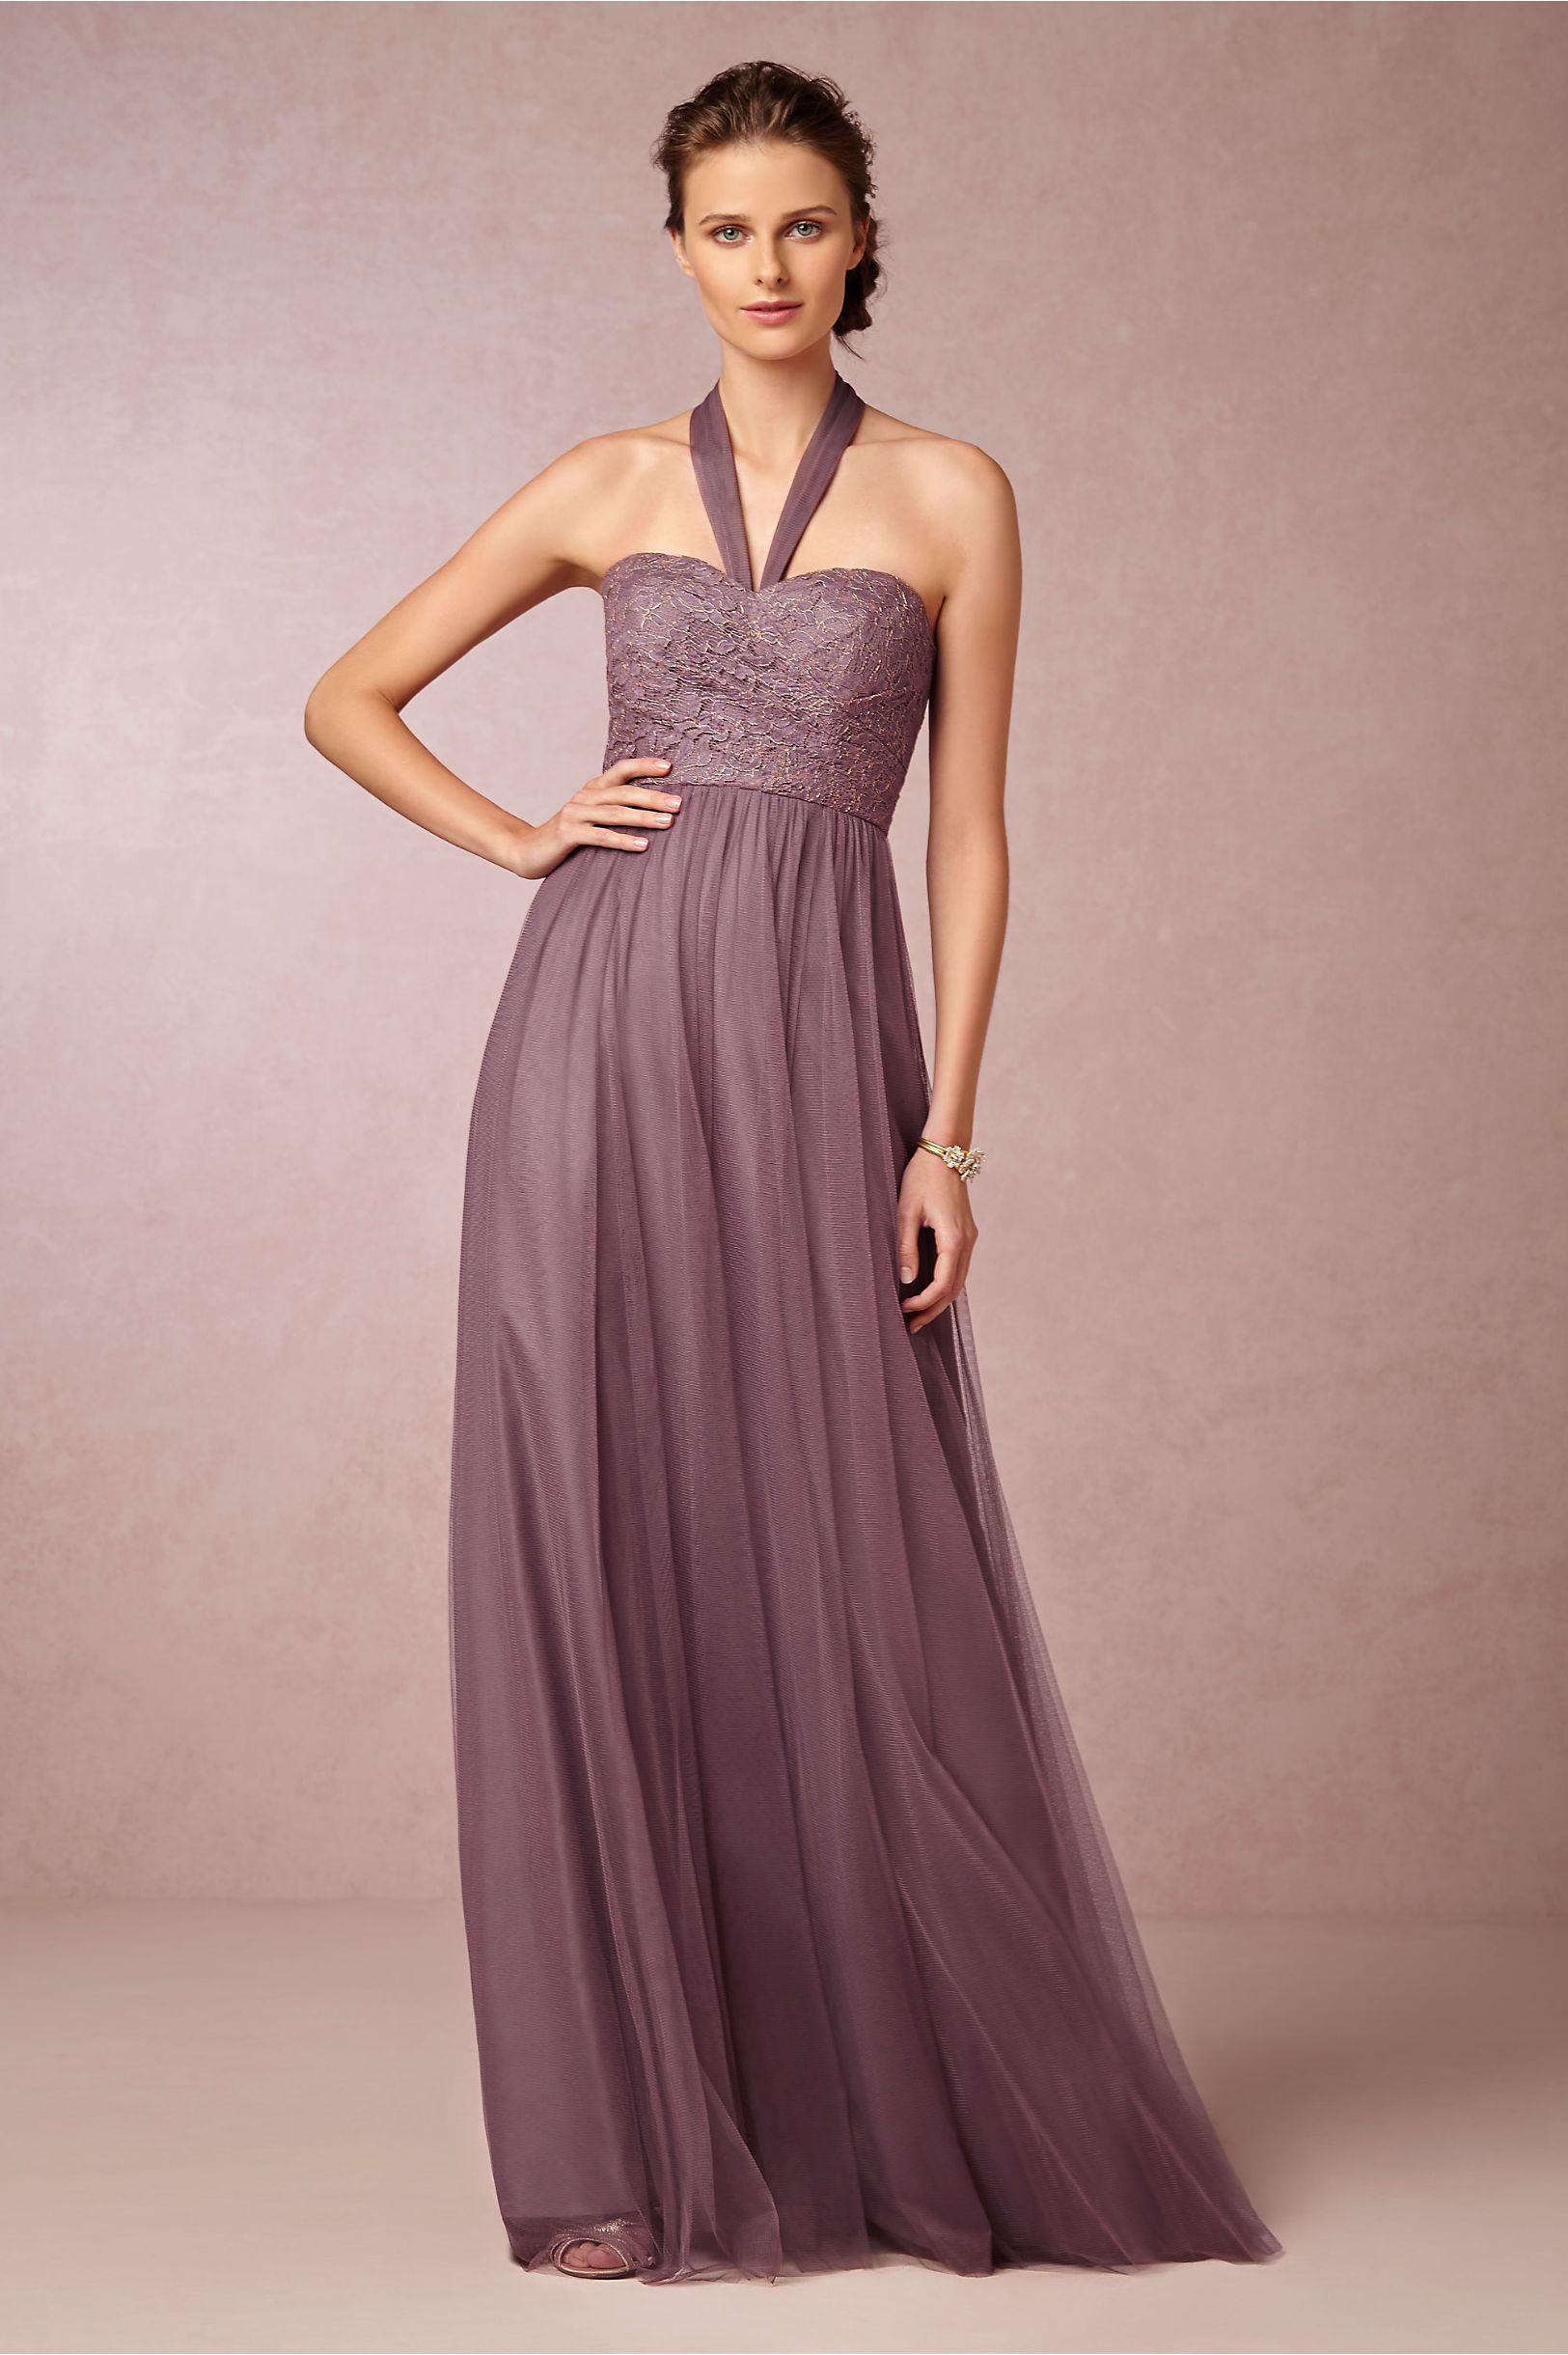 Juliette Dress from BHLDN | Wedding Business | Pinterest | Vestidos ...